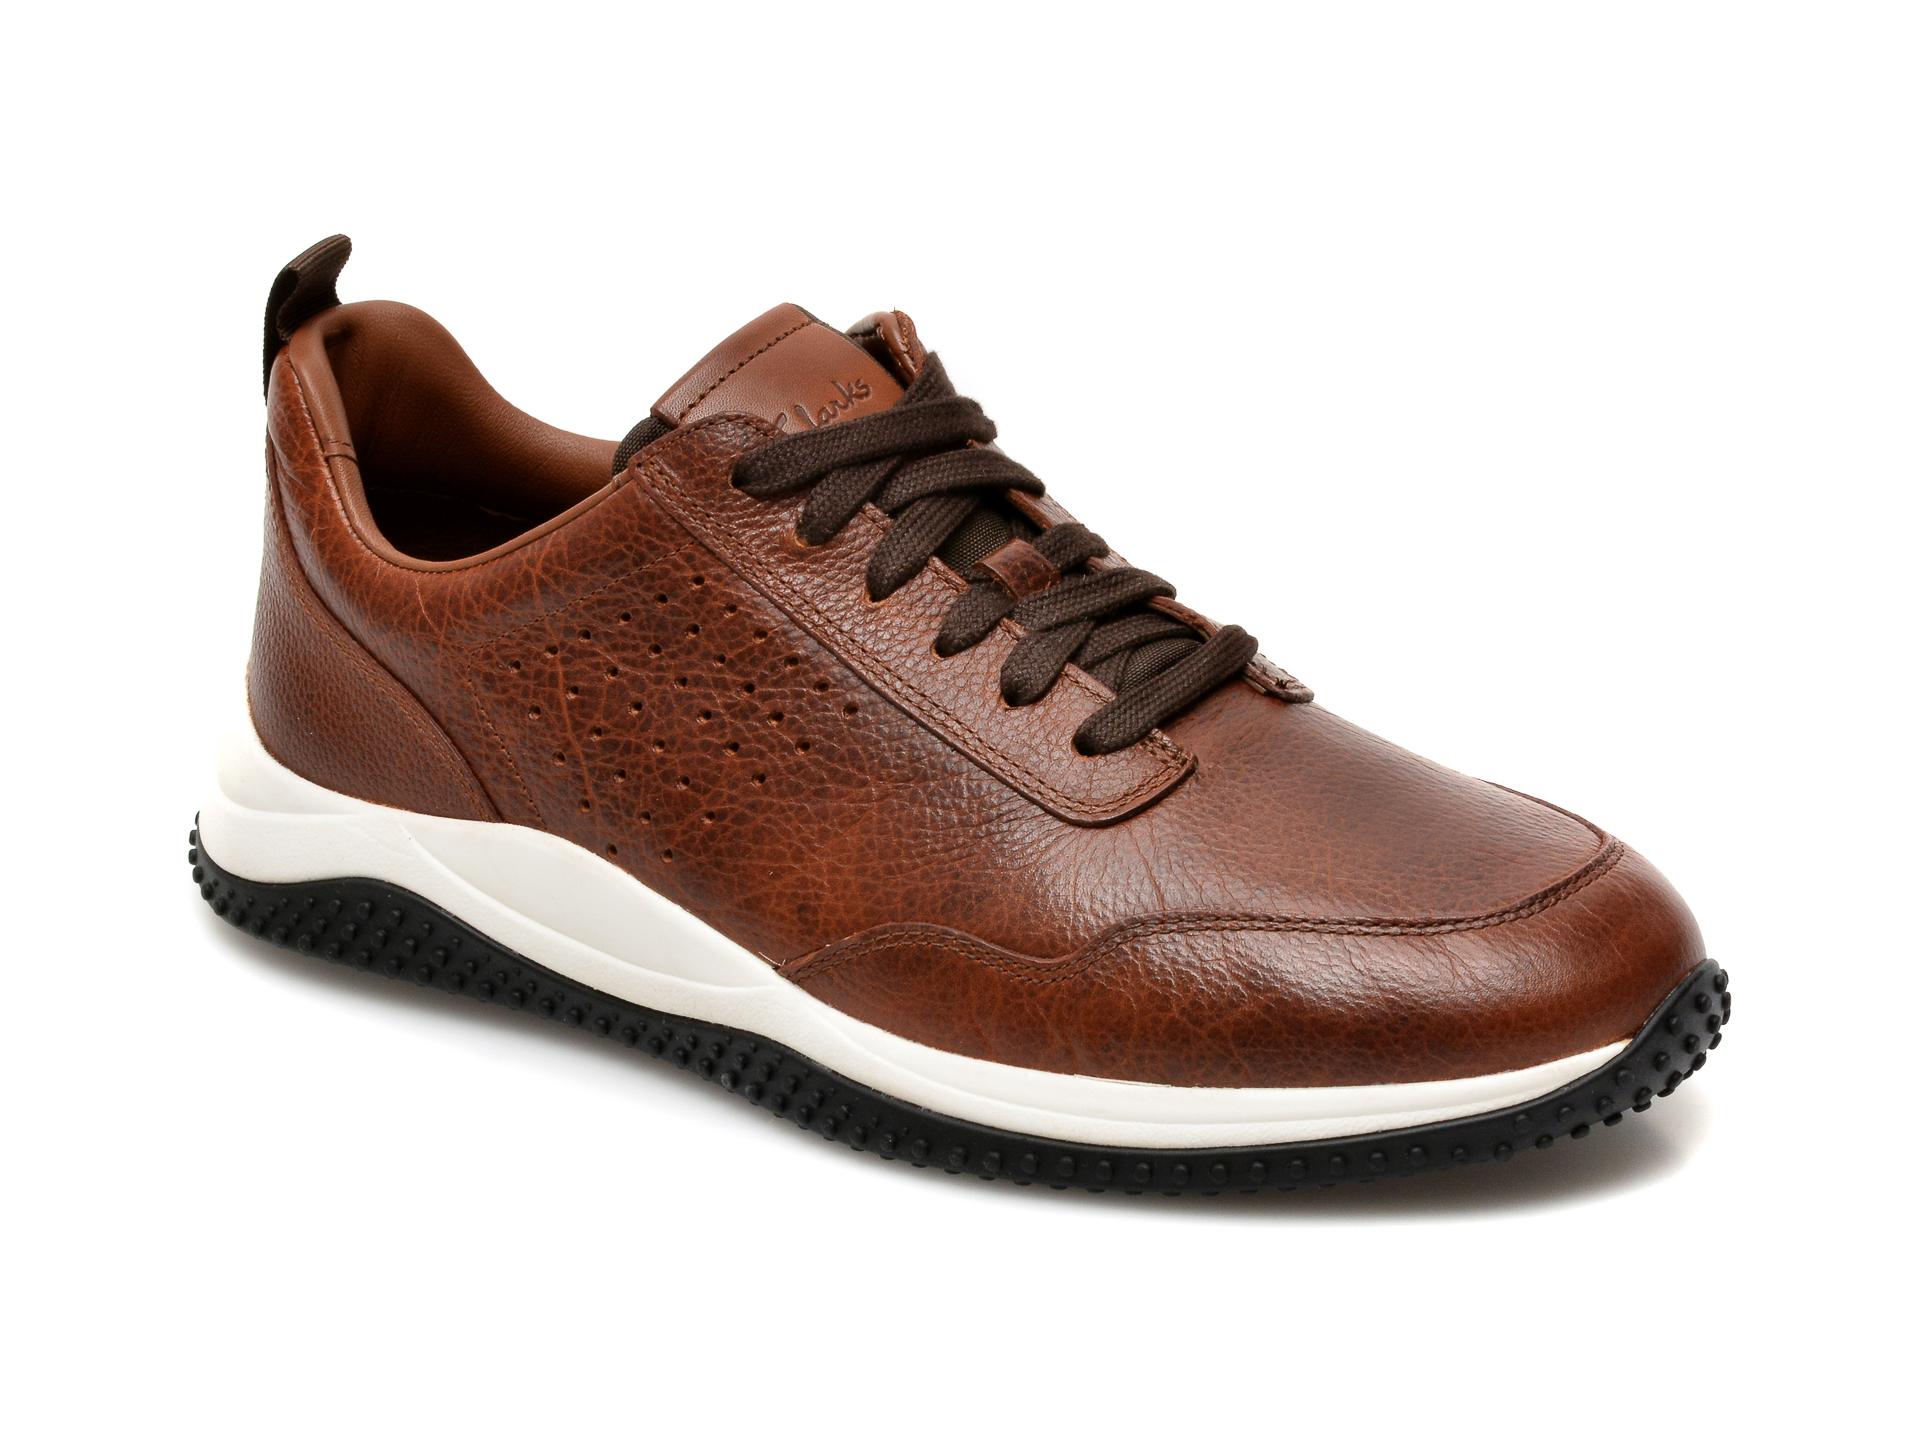 Pantofi CLARKS maro, Puxton Lace, din piele naturala imagine otter.ro